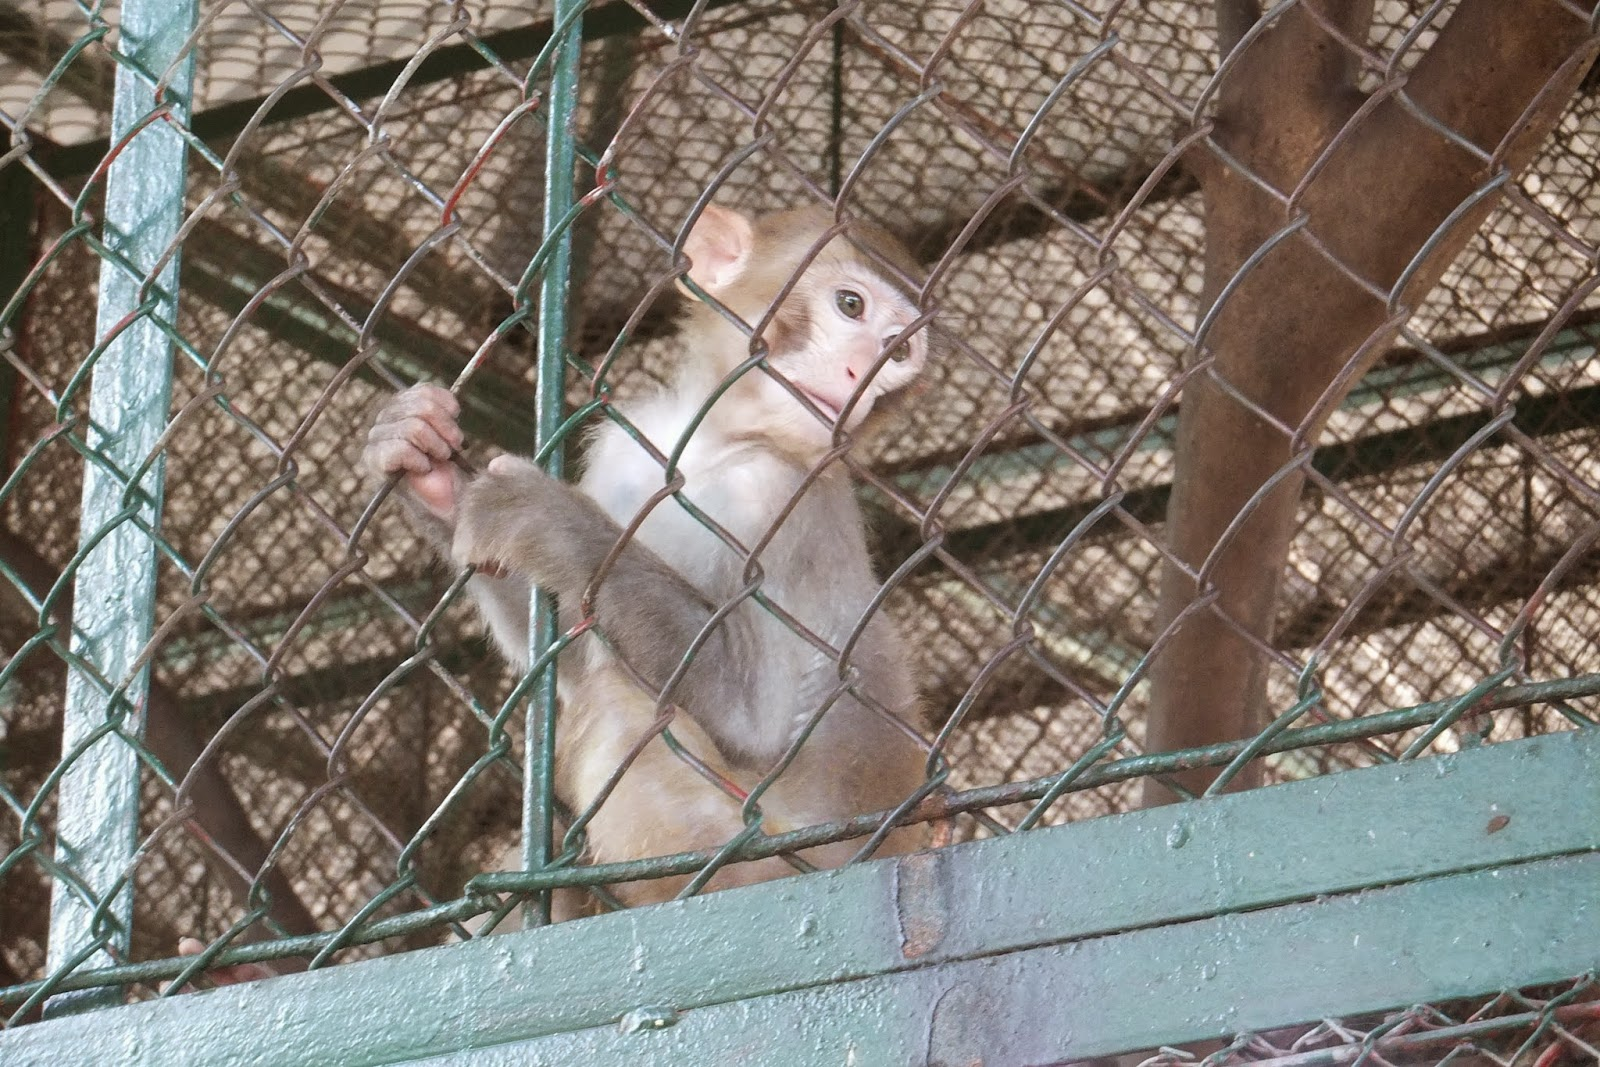 hanoi-zoo-monkey ハノイ動物園の猿2